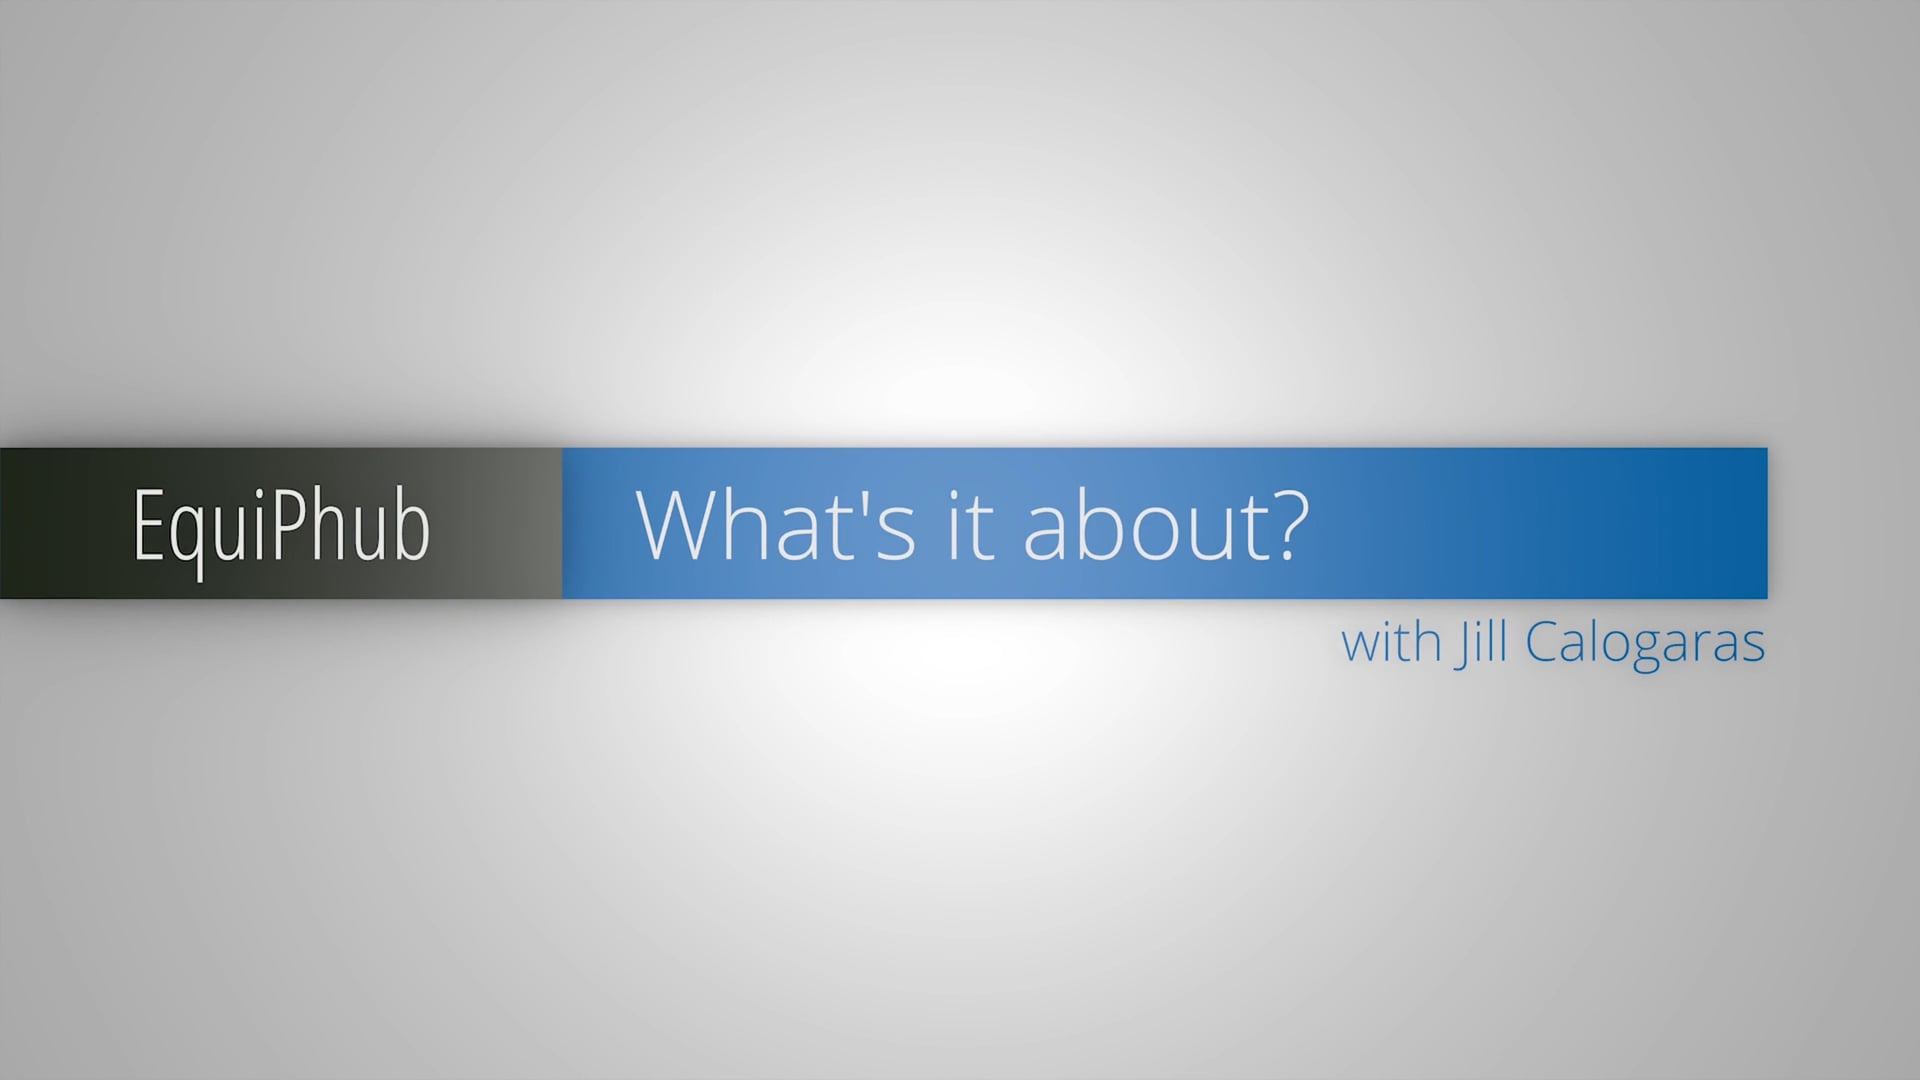 Introducing EHUB - with Jill Calogaras